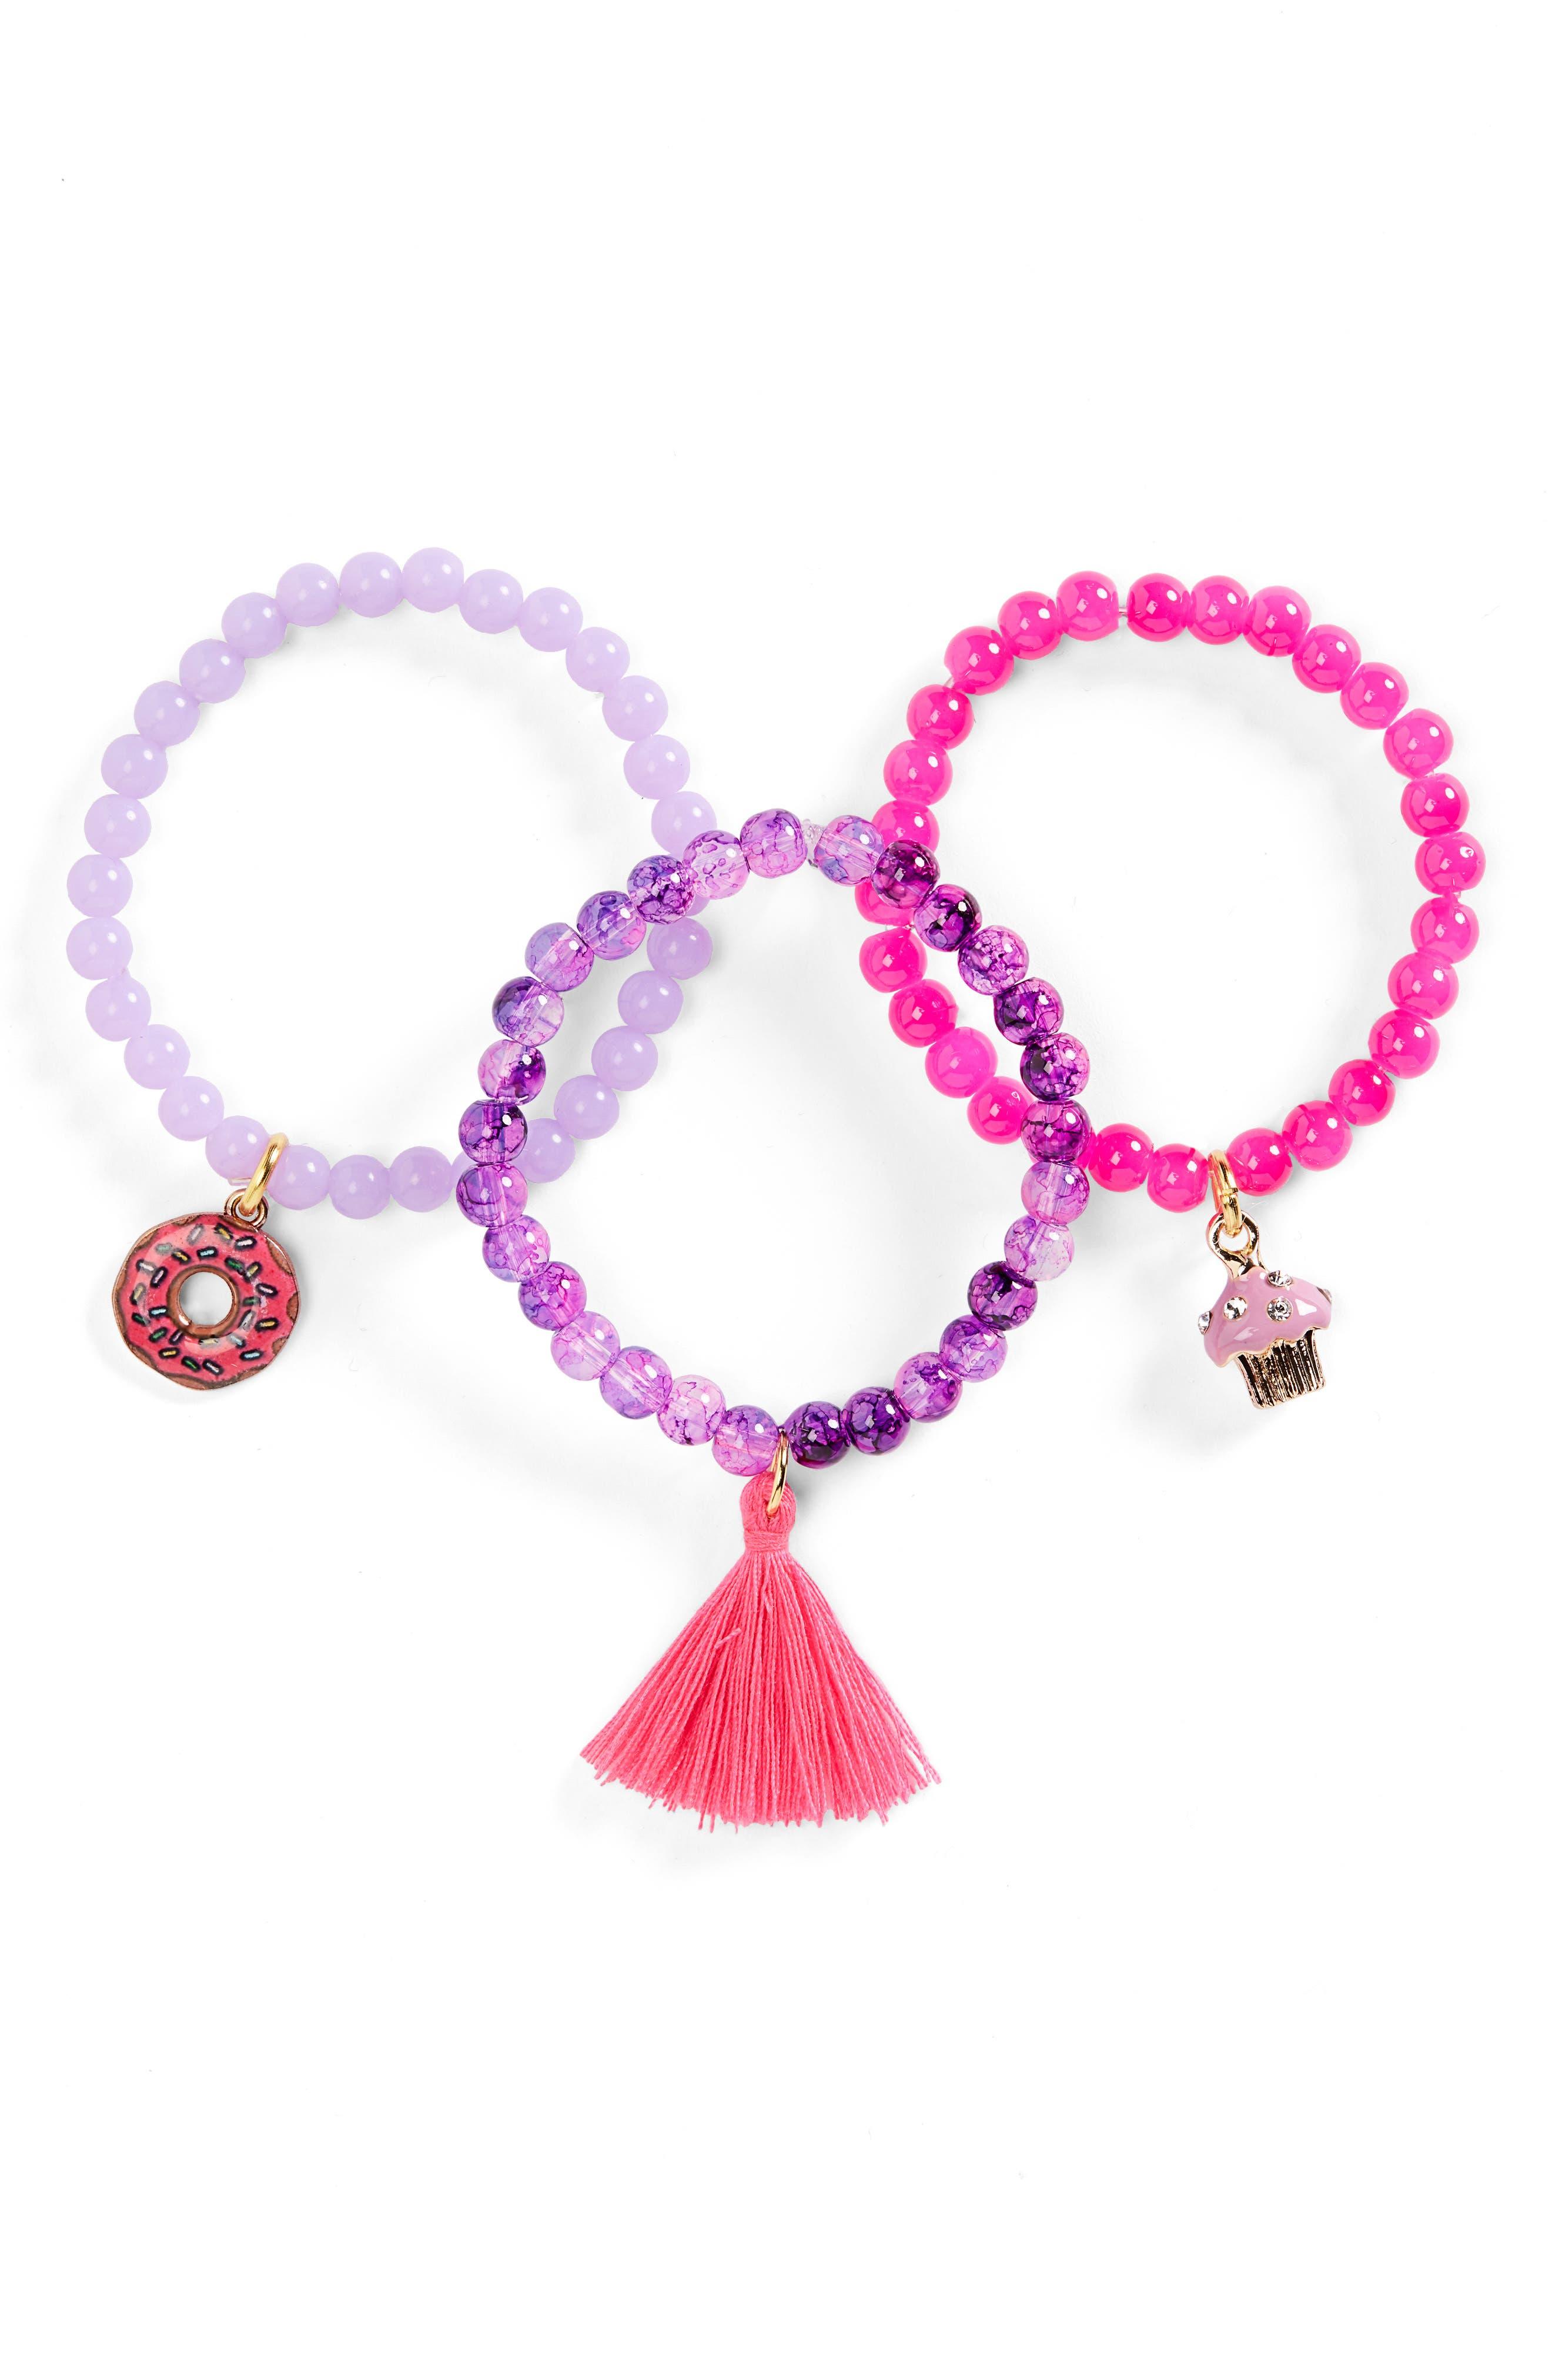 Set of 3 Beaded Stretch Bracelets,                             Main thumbnail 1, color,                             PURPLE